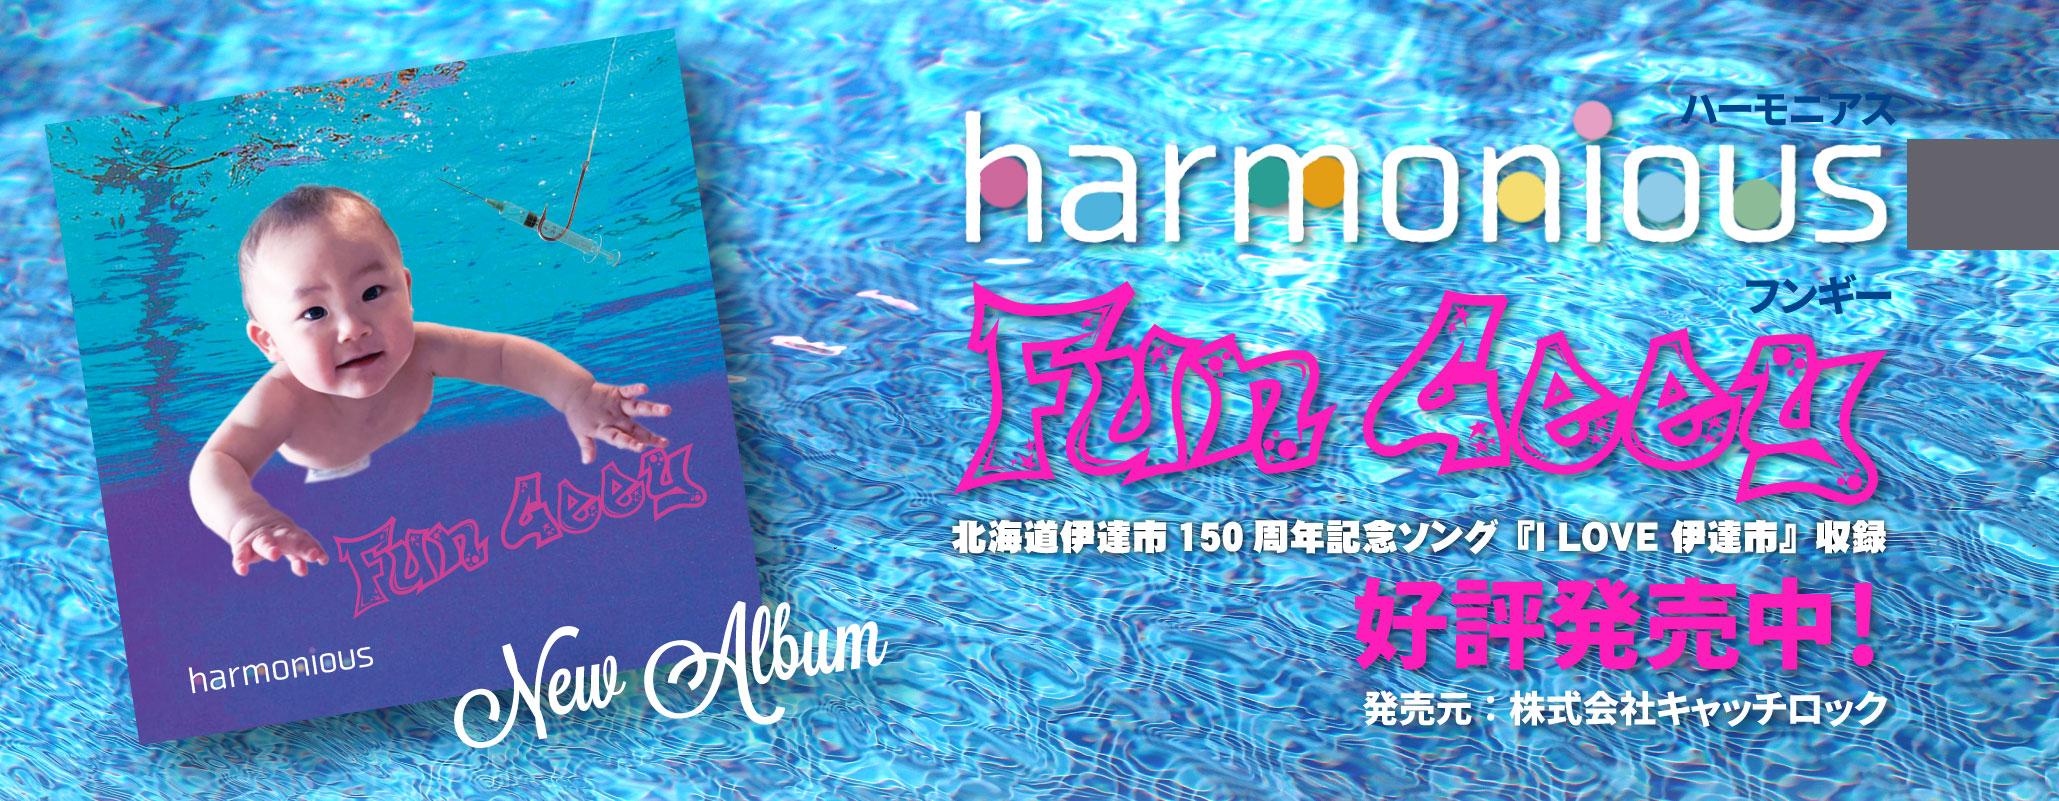 slider_harmonious